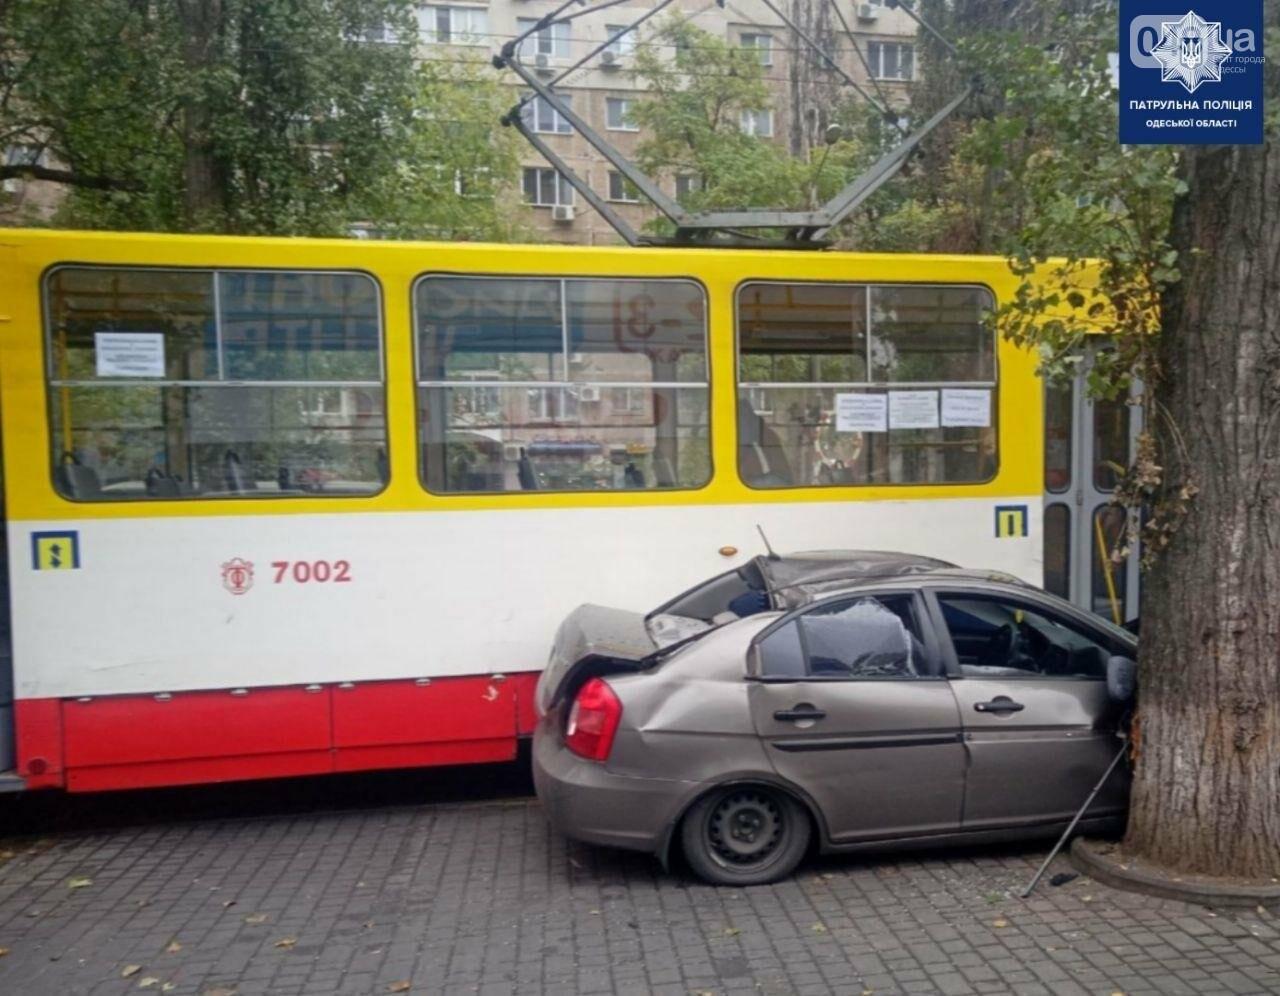 В Одессе трамвай раздавил автомобиль Hyundai, - ФОТО, фото-2